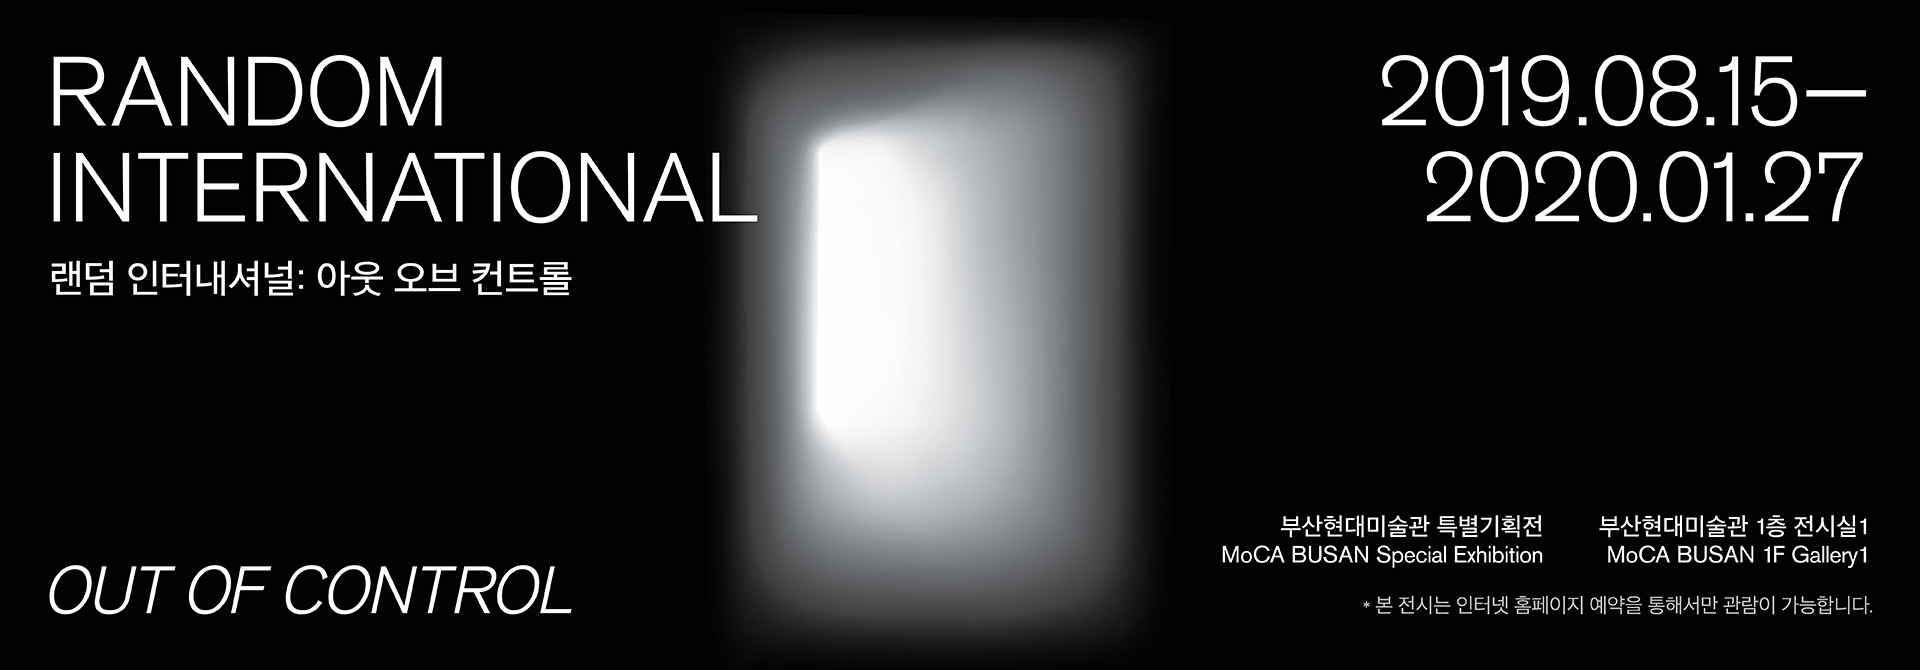 RANDOM INTERNATIONAL: OUT OF CONTROL 랜덤 인터내셔널: 아웃 오브 컨트롤 2019.08.15 ~ 2020.01.27, 부산현대미술관 특별기획전 MoCA BUSAN Special Exhibition 부산현대미술관 1층 전시실1 MoCA BUSAN 1F Gallery1 ※ 본 전시는 인터넷 홈페이지 예약을 통해서만 관람이 가능합니다.